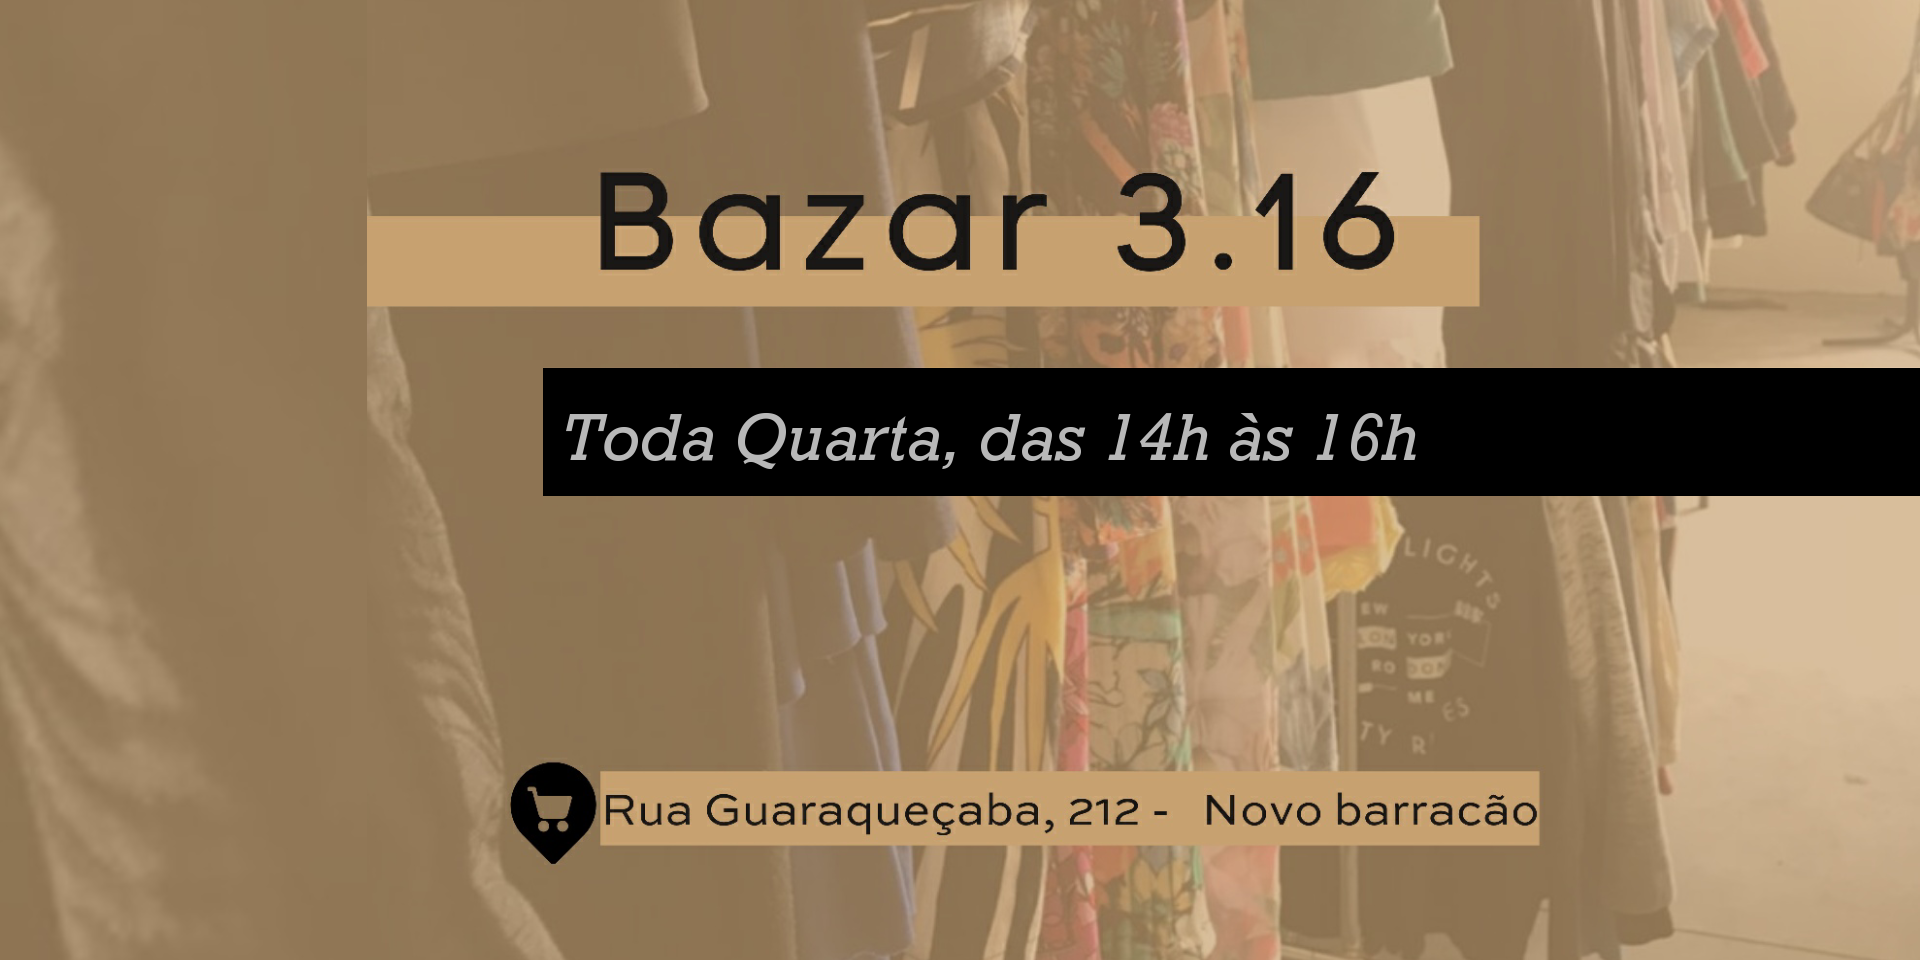 75-bazar-316-airport-church-sao-jose-dos-pinhais-parana-001